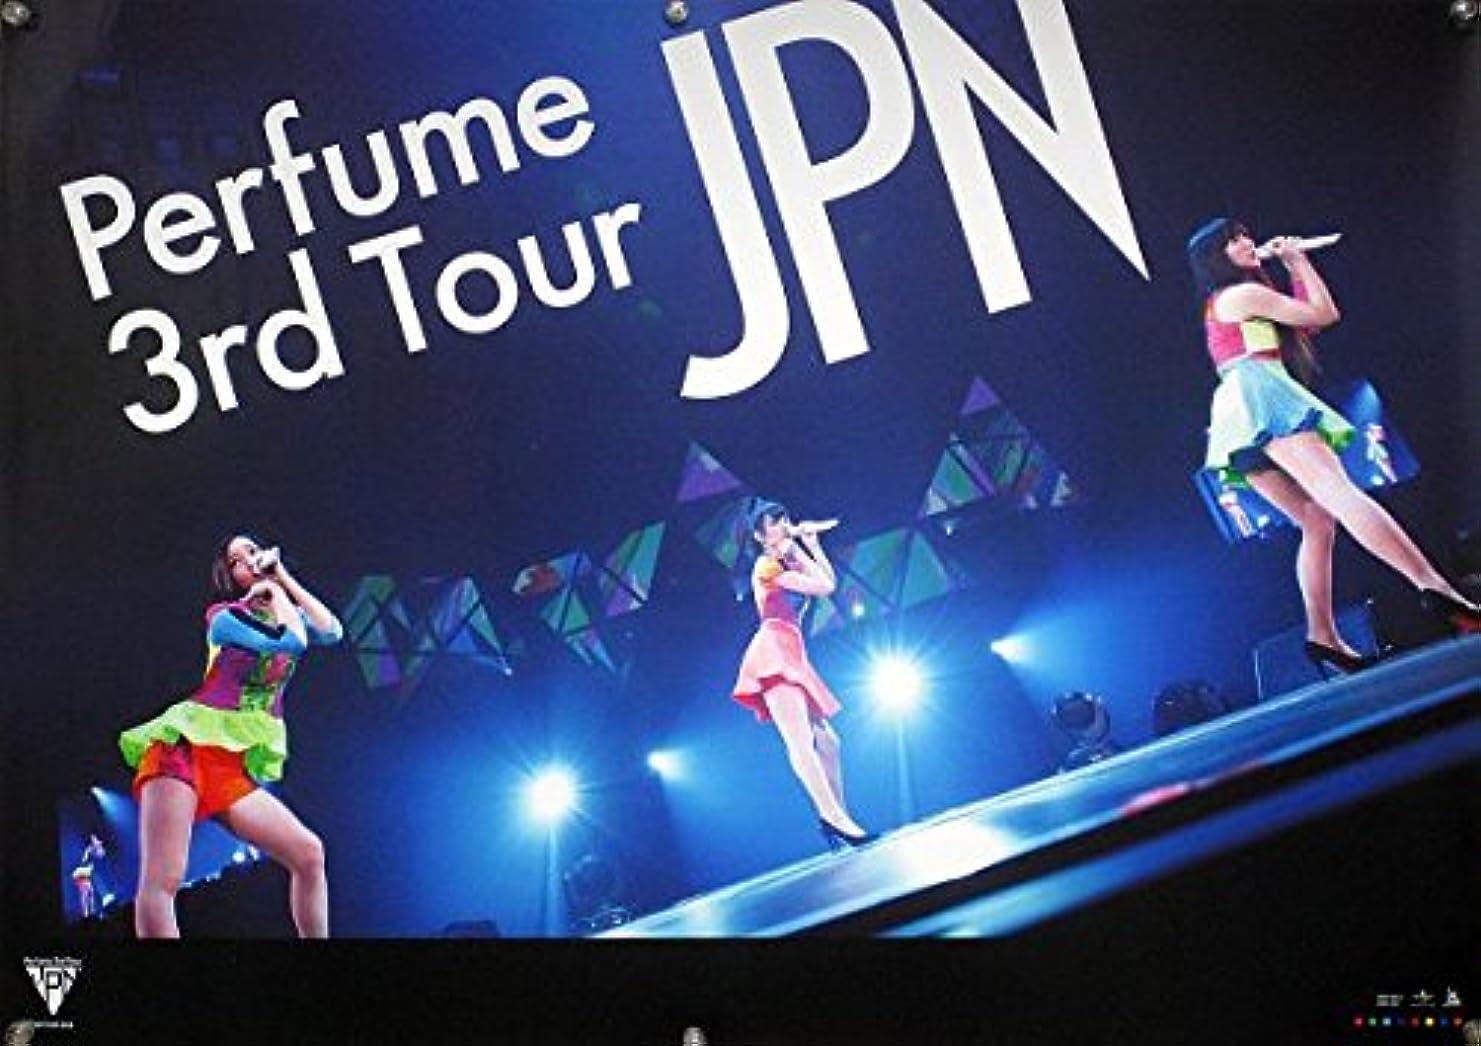 Perfume パフューム B2ポスター 1N03008